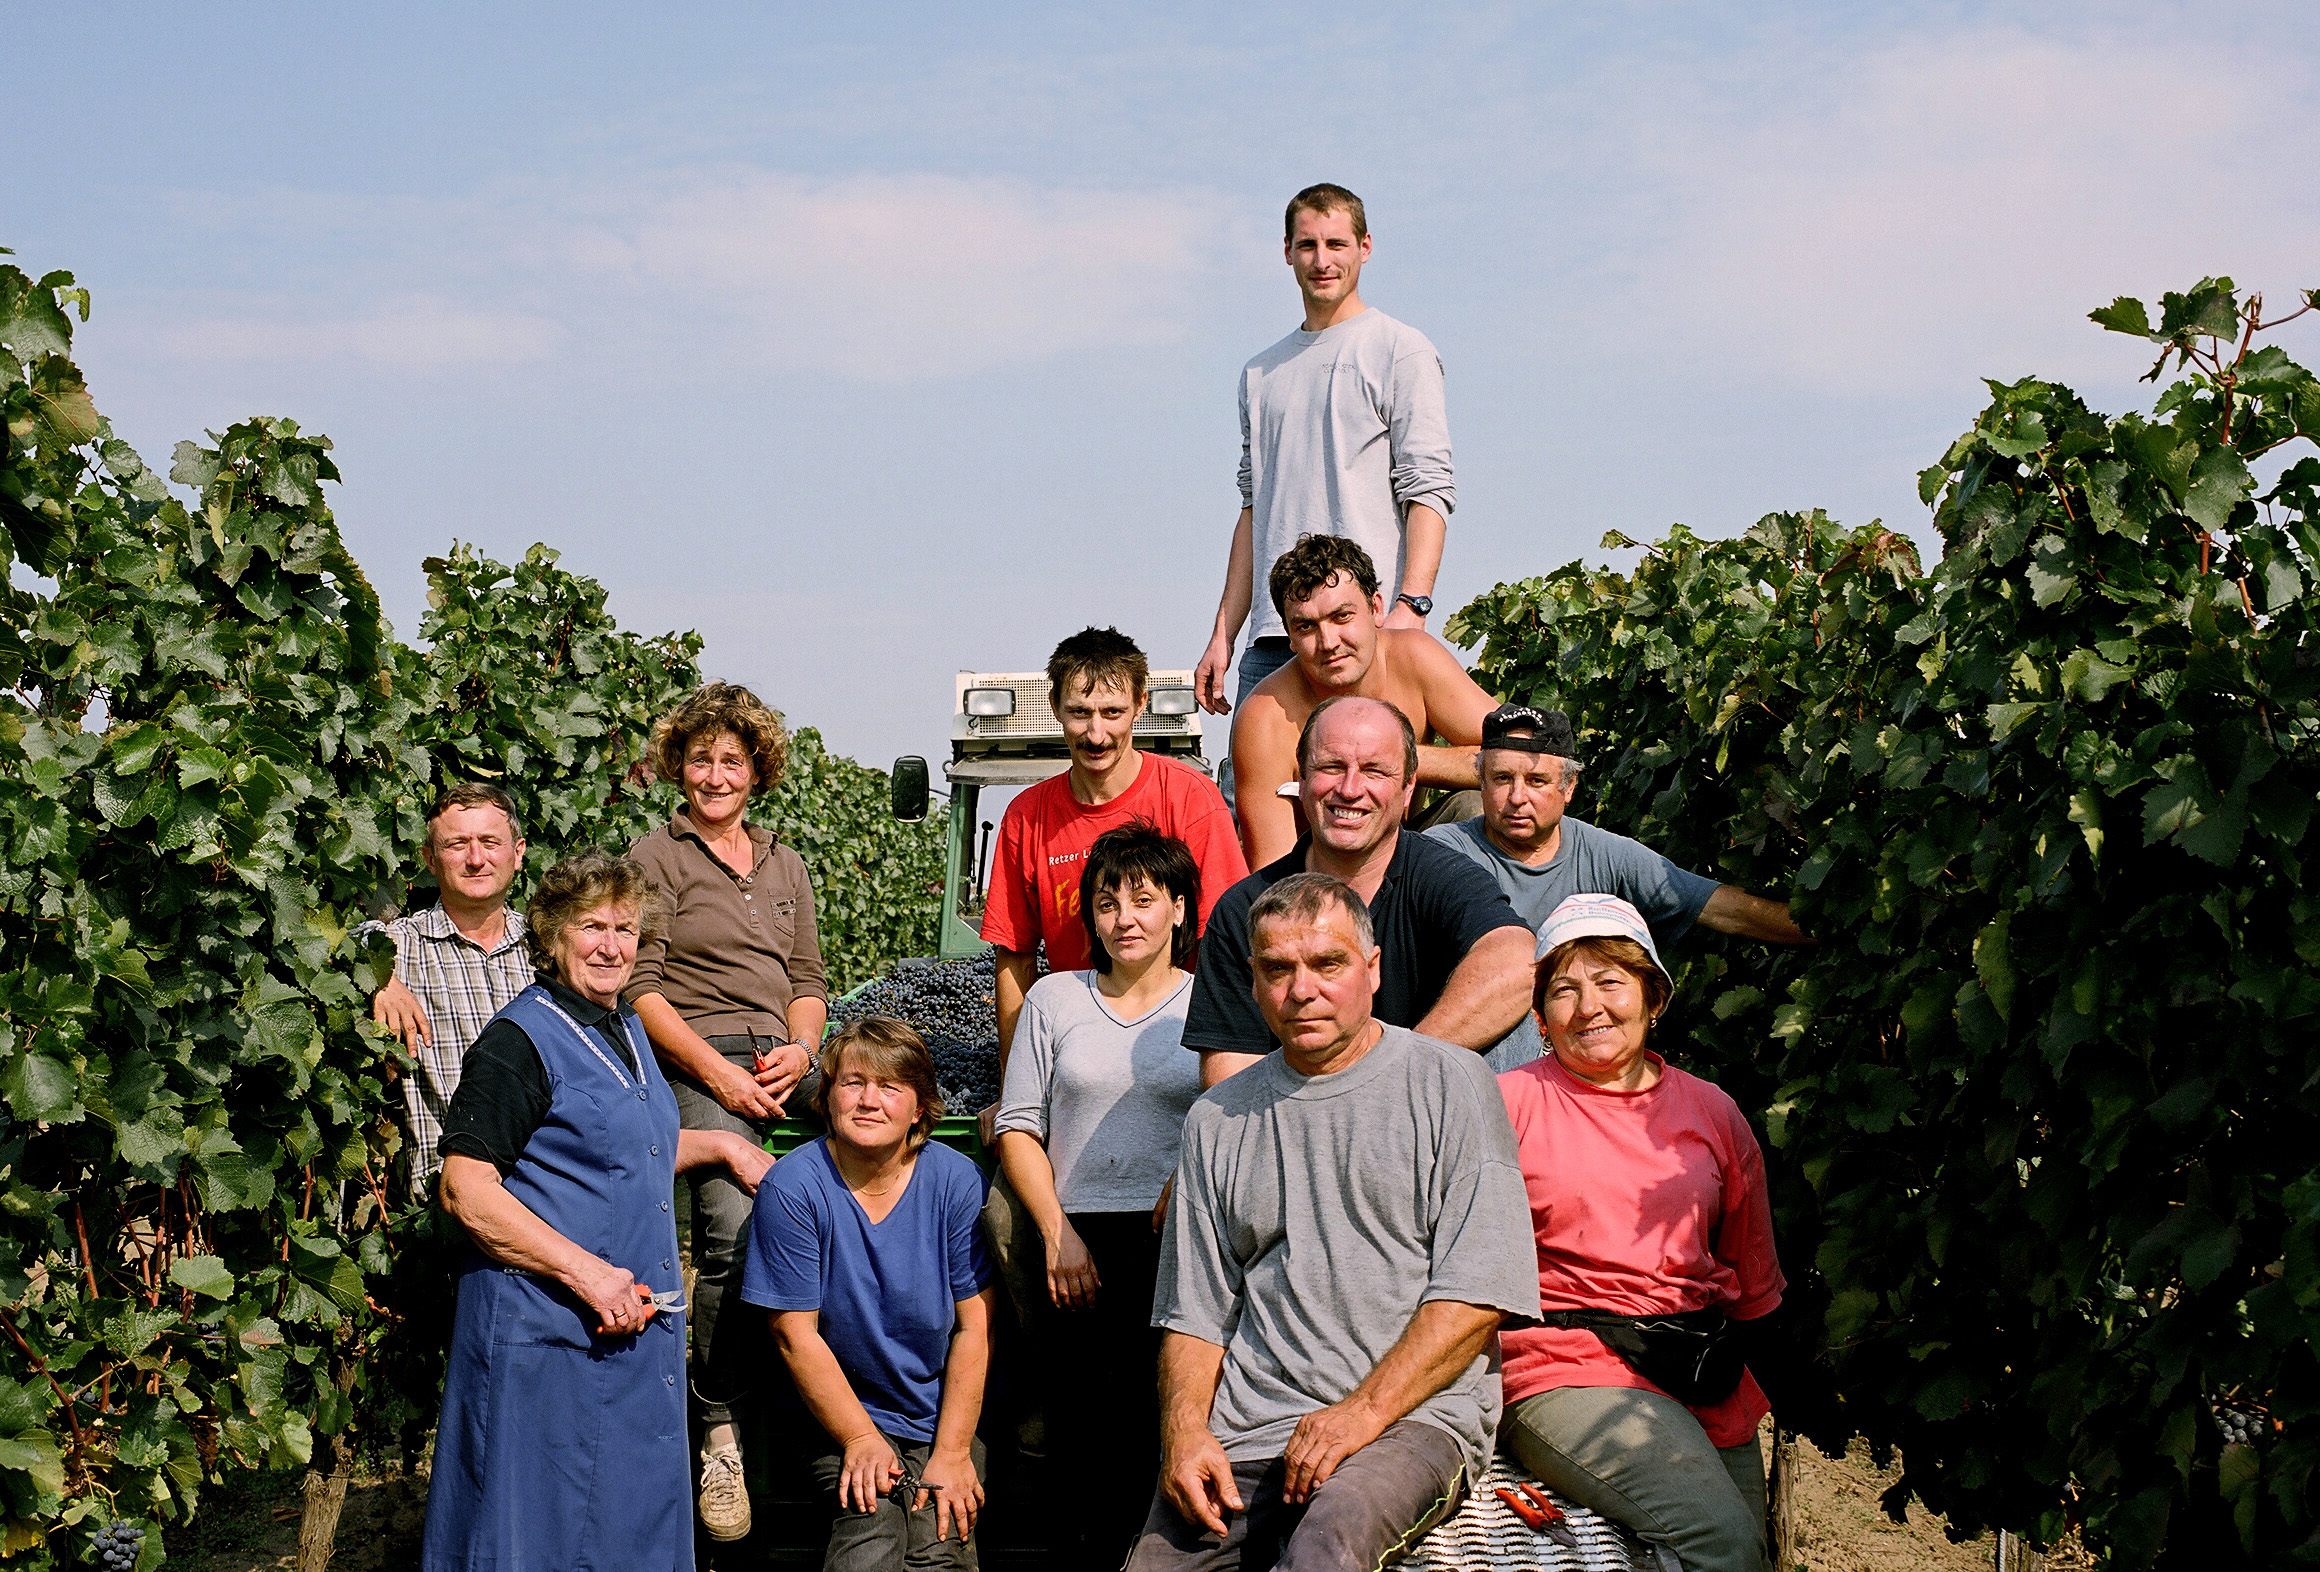 Austria_Zull_winery image.jpg